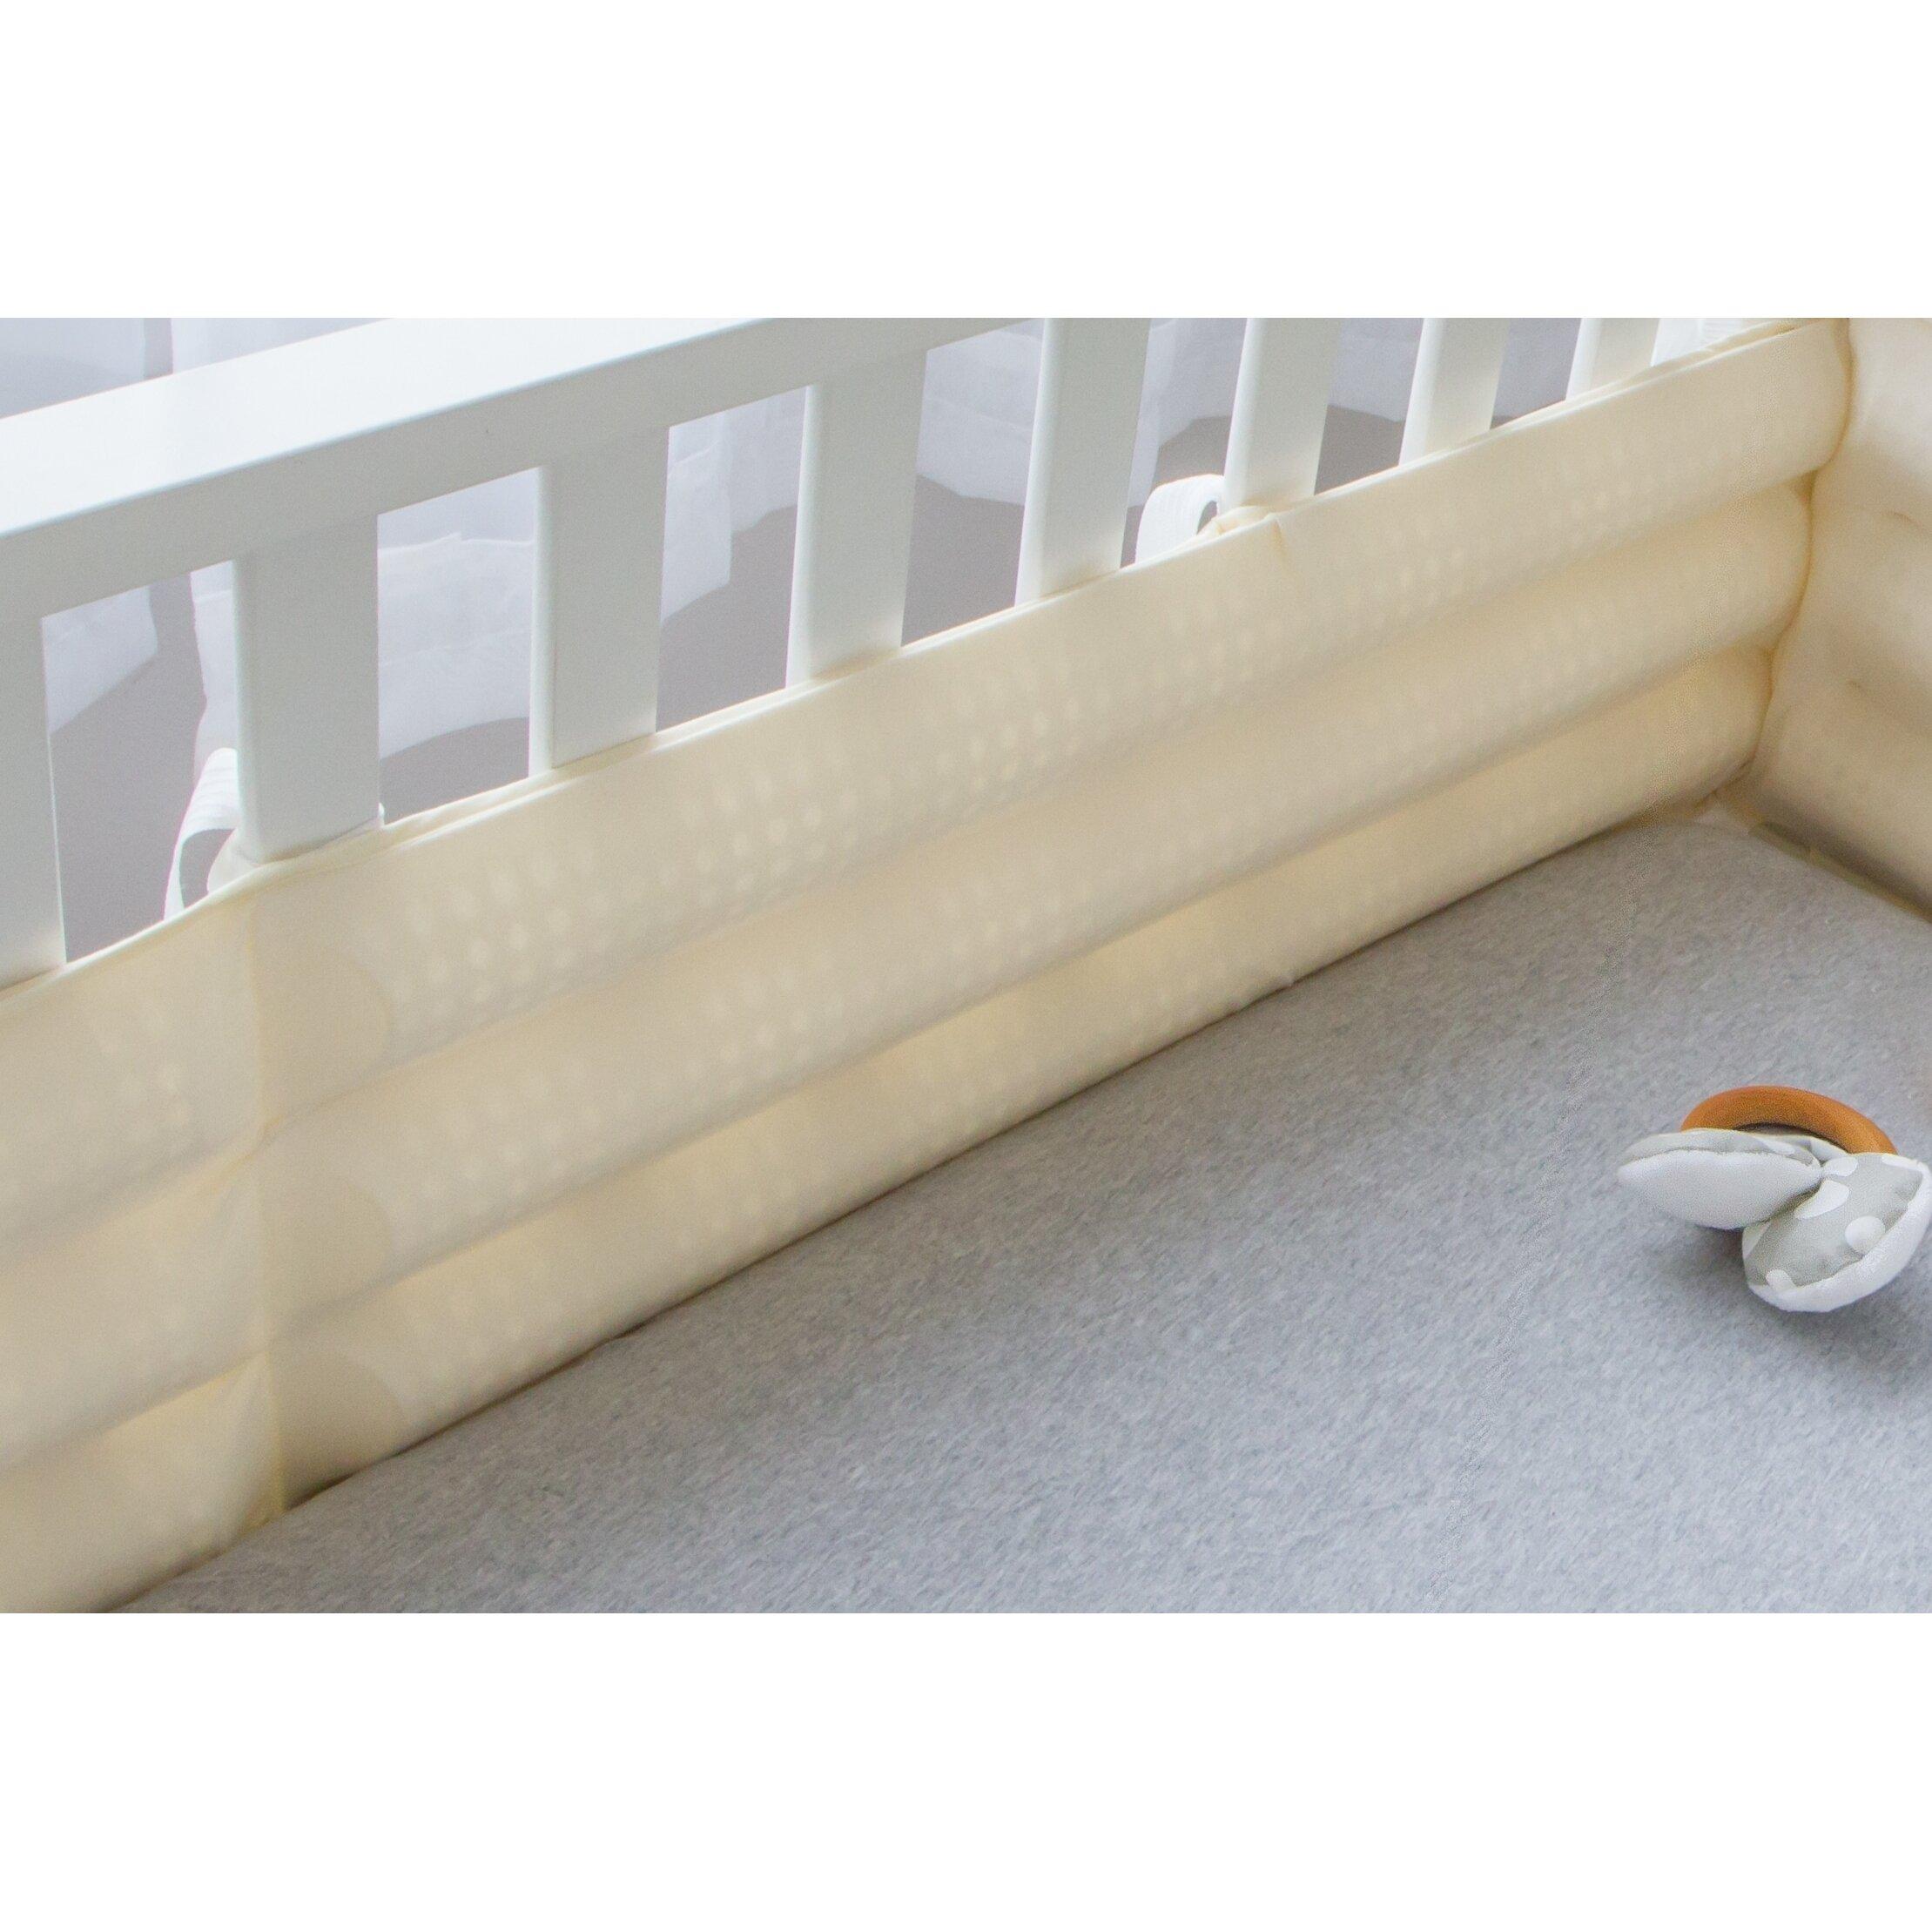 Bumper for crib for sale - Bitzy Baby Breathable Safe Crib Bumper